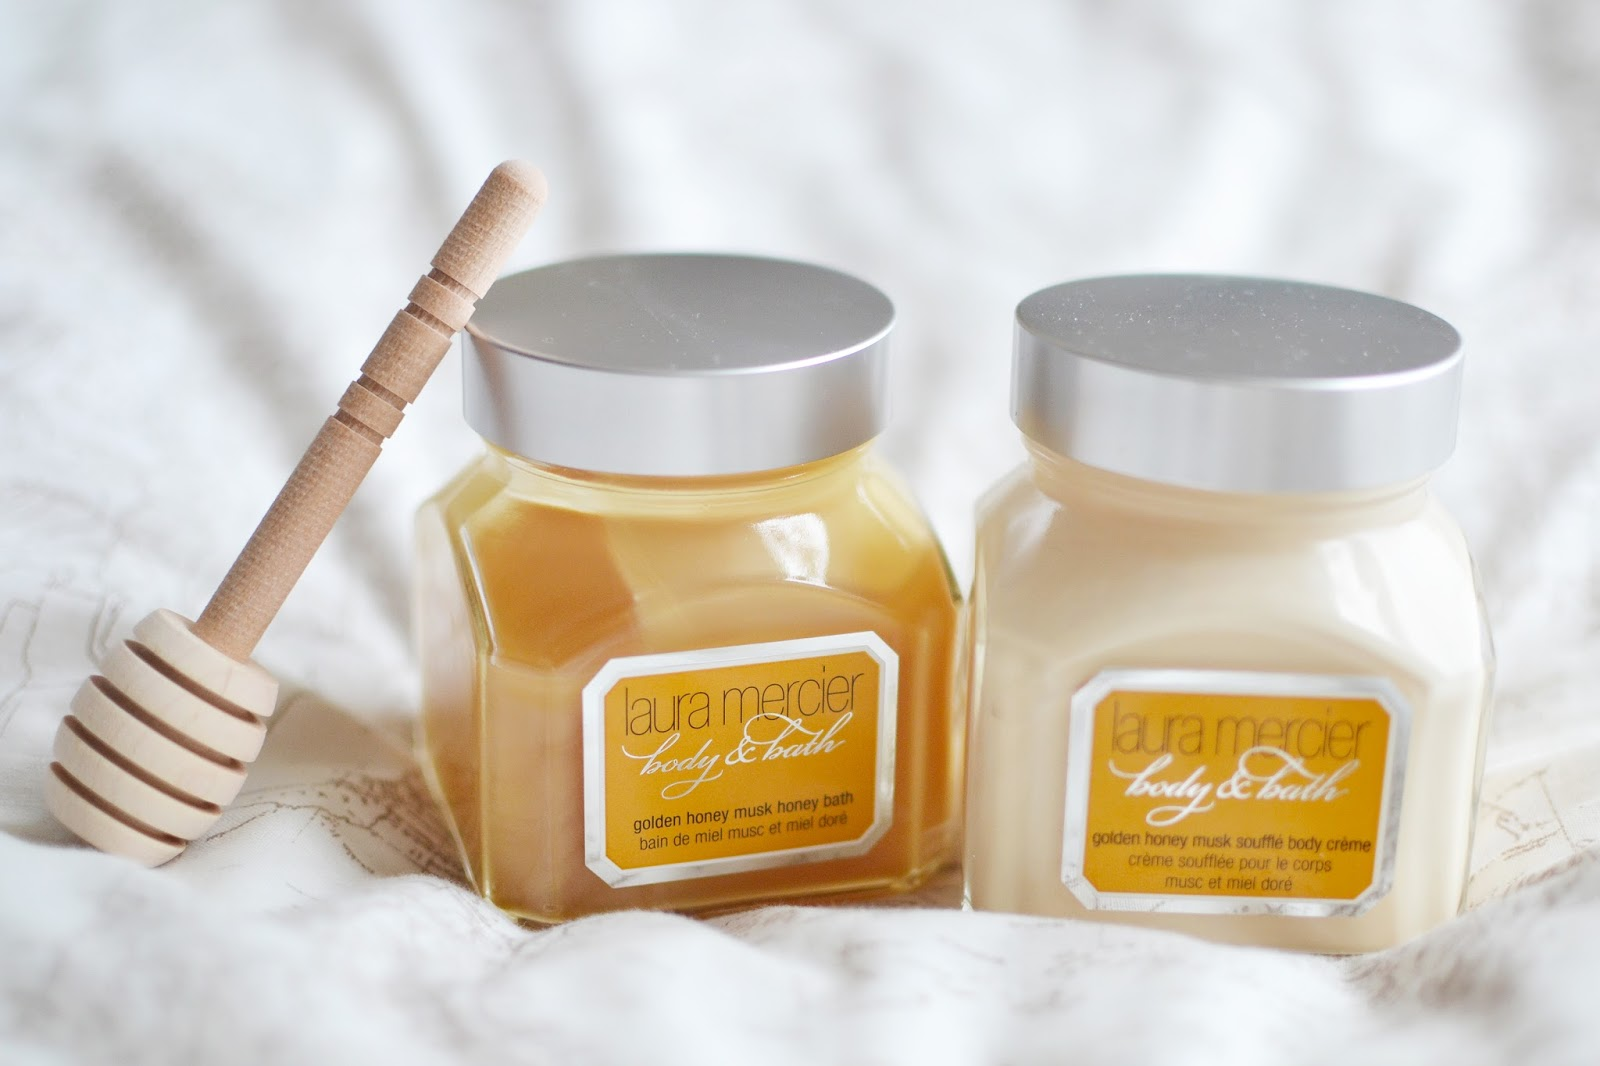 laura mercier honey bath, laura mercier honey bath review, laura mercier golden honey musk